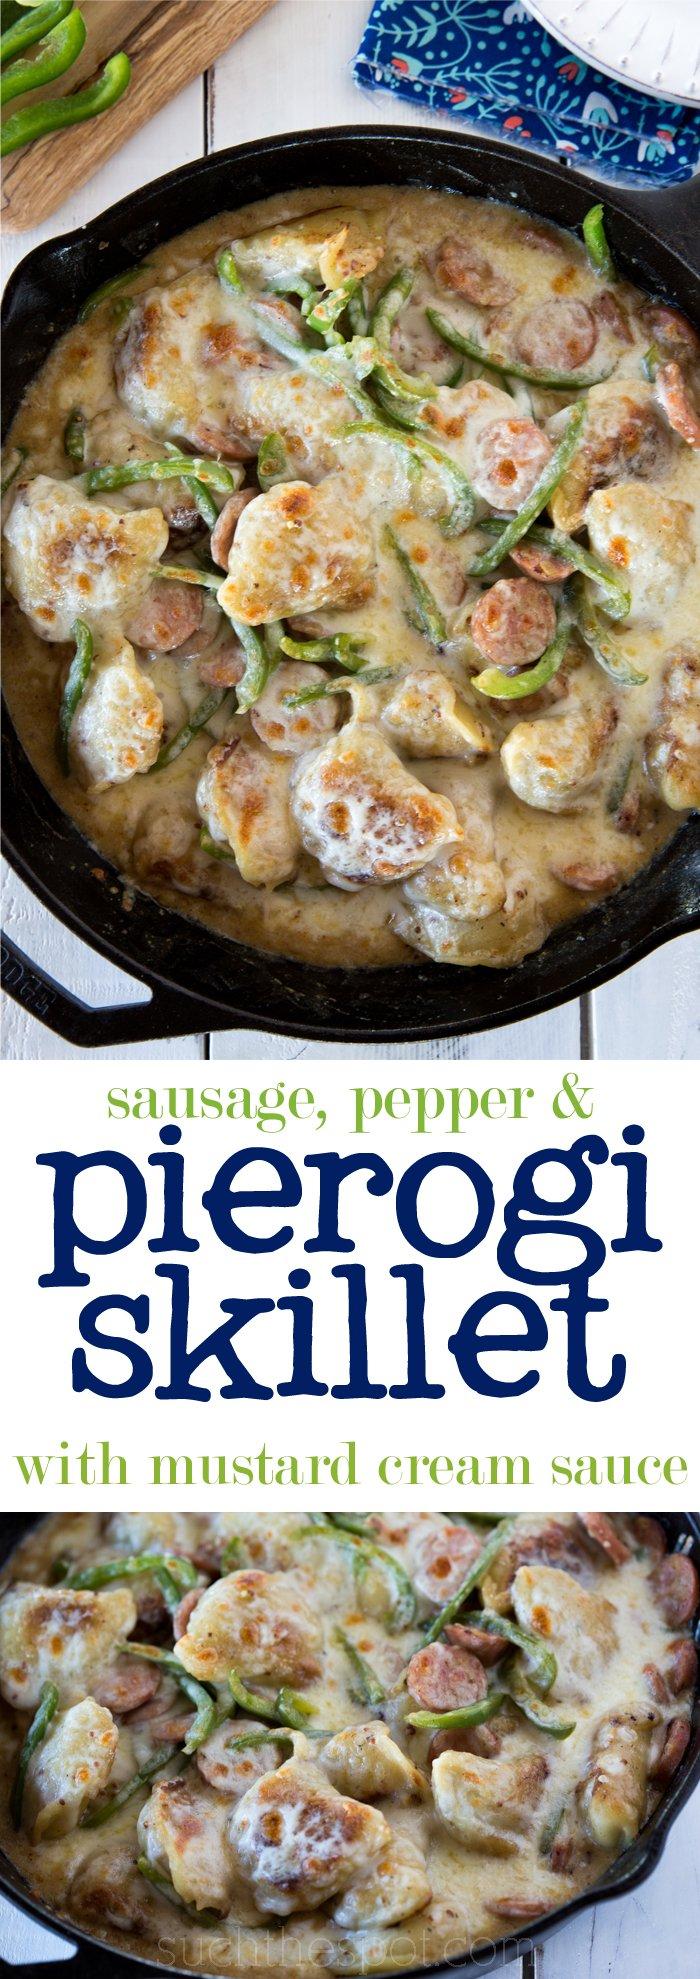 Sausage, pepper & pierogi skillet with mustard cream sauce